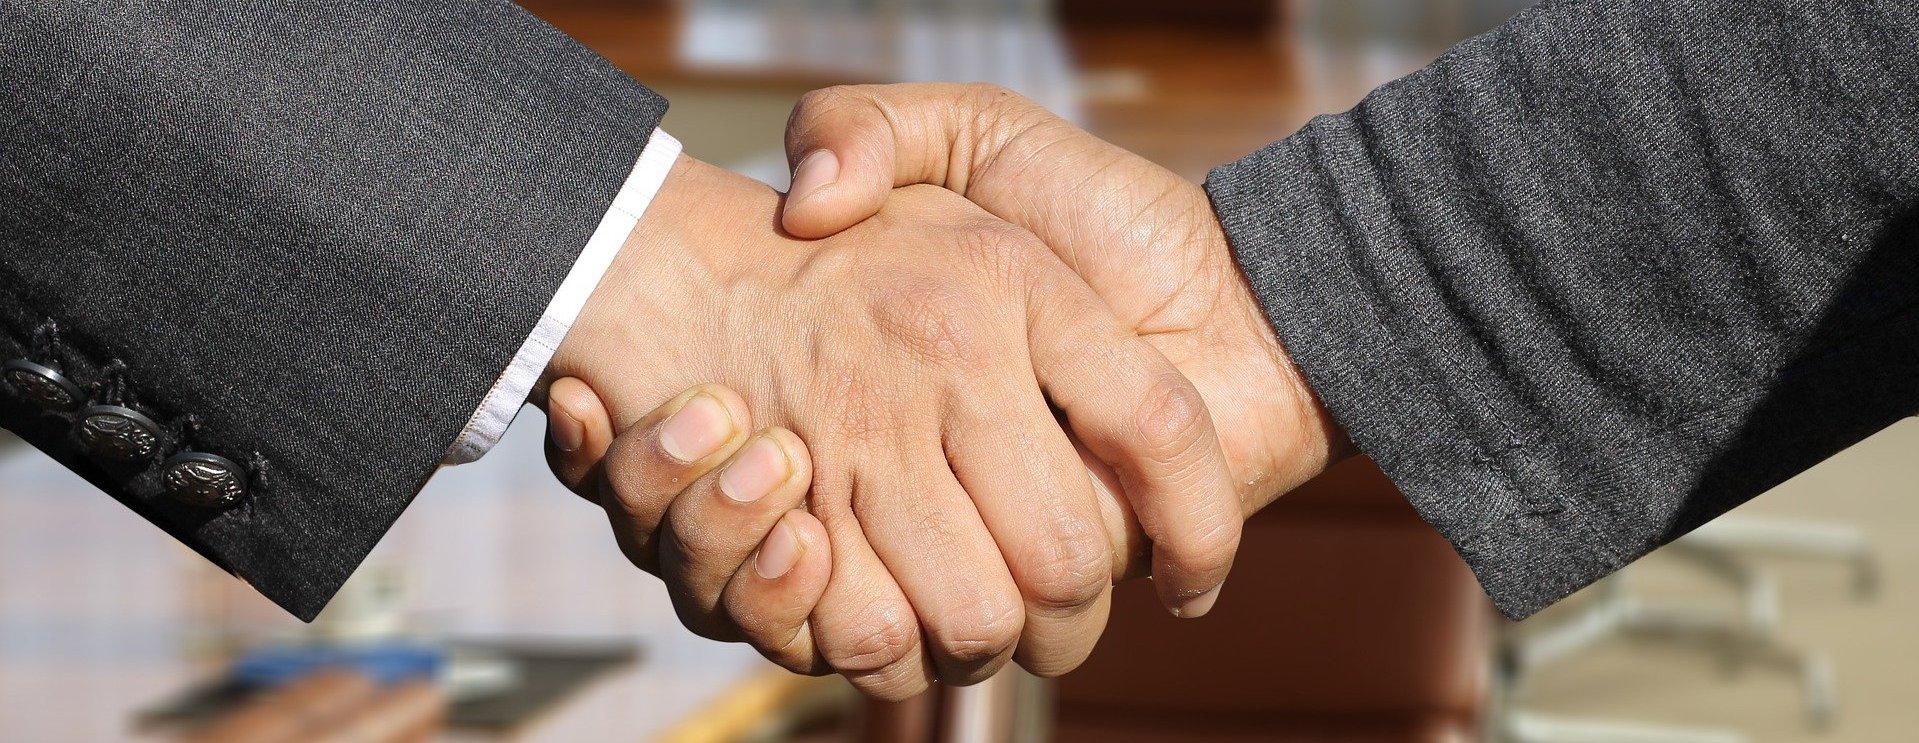 VEB RF和乌兹别克斯坦的一家工厂将开出高达18亿卢布的信贷额度。